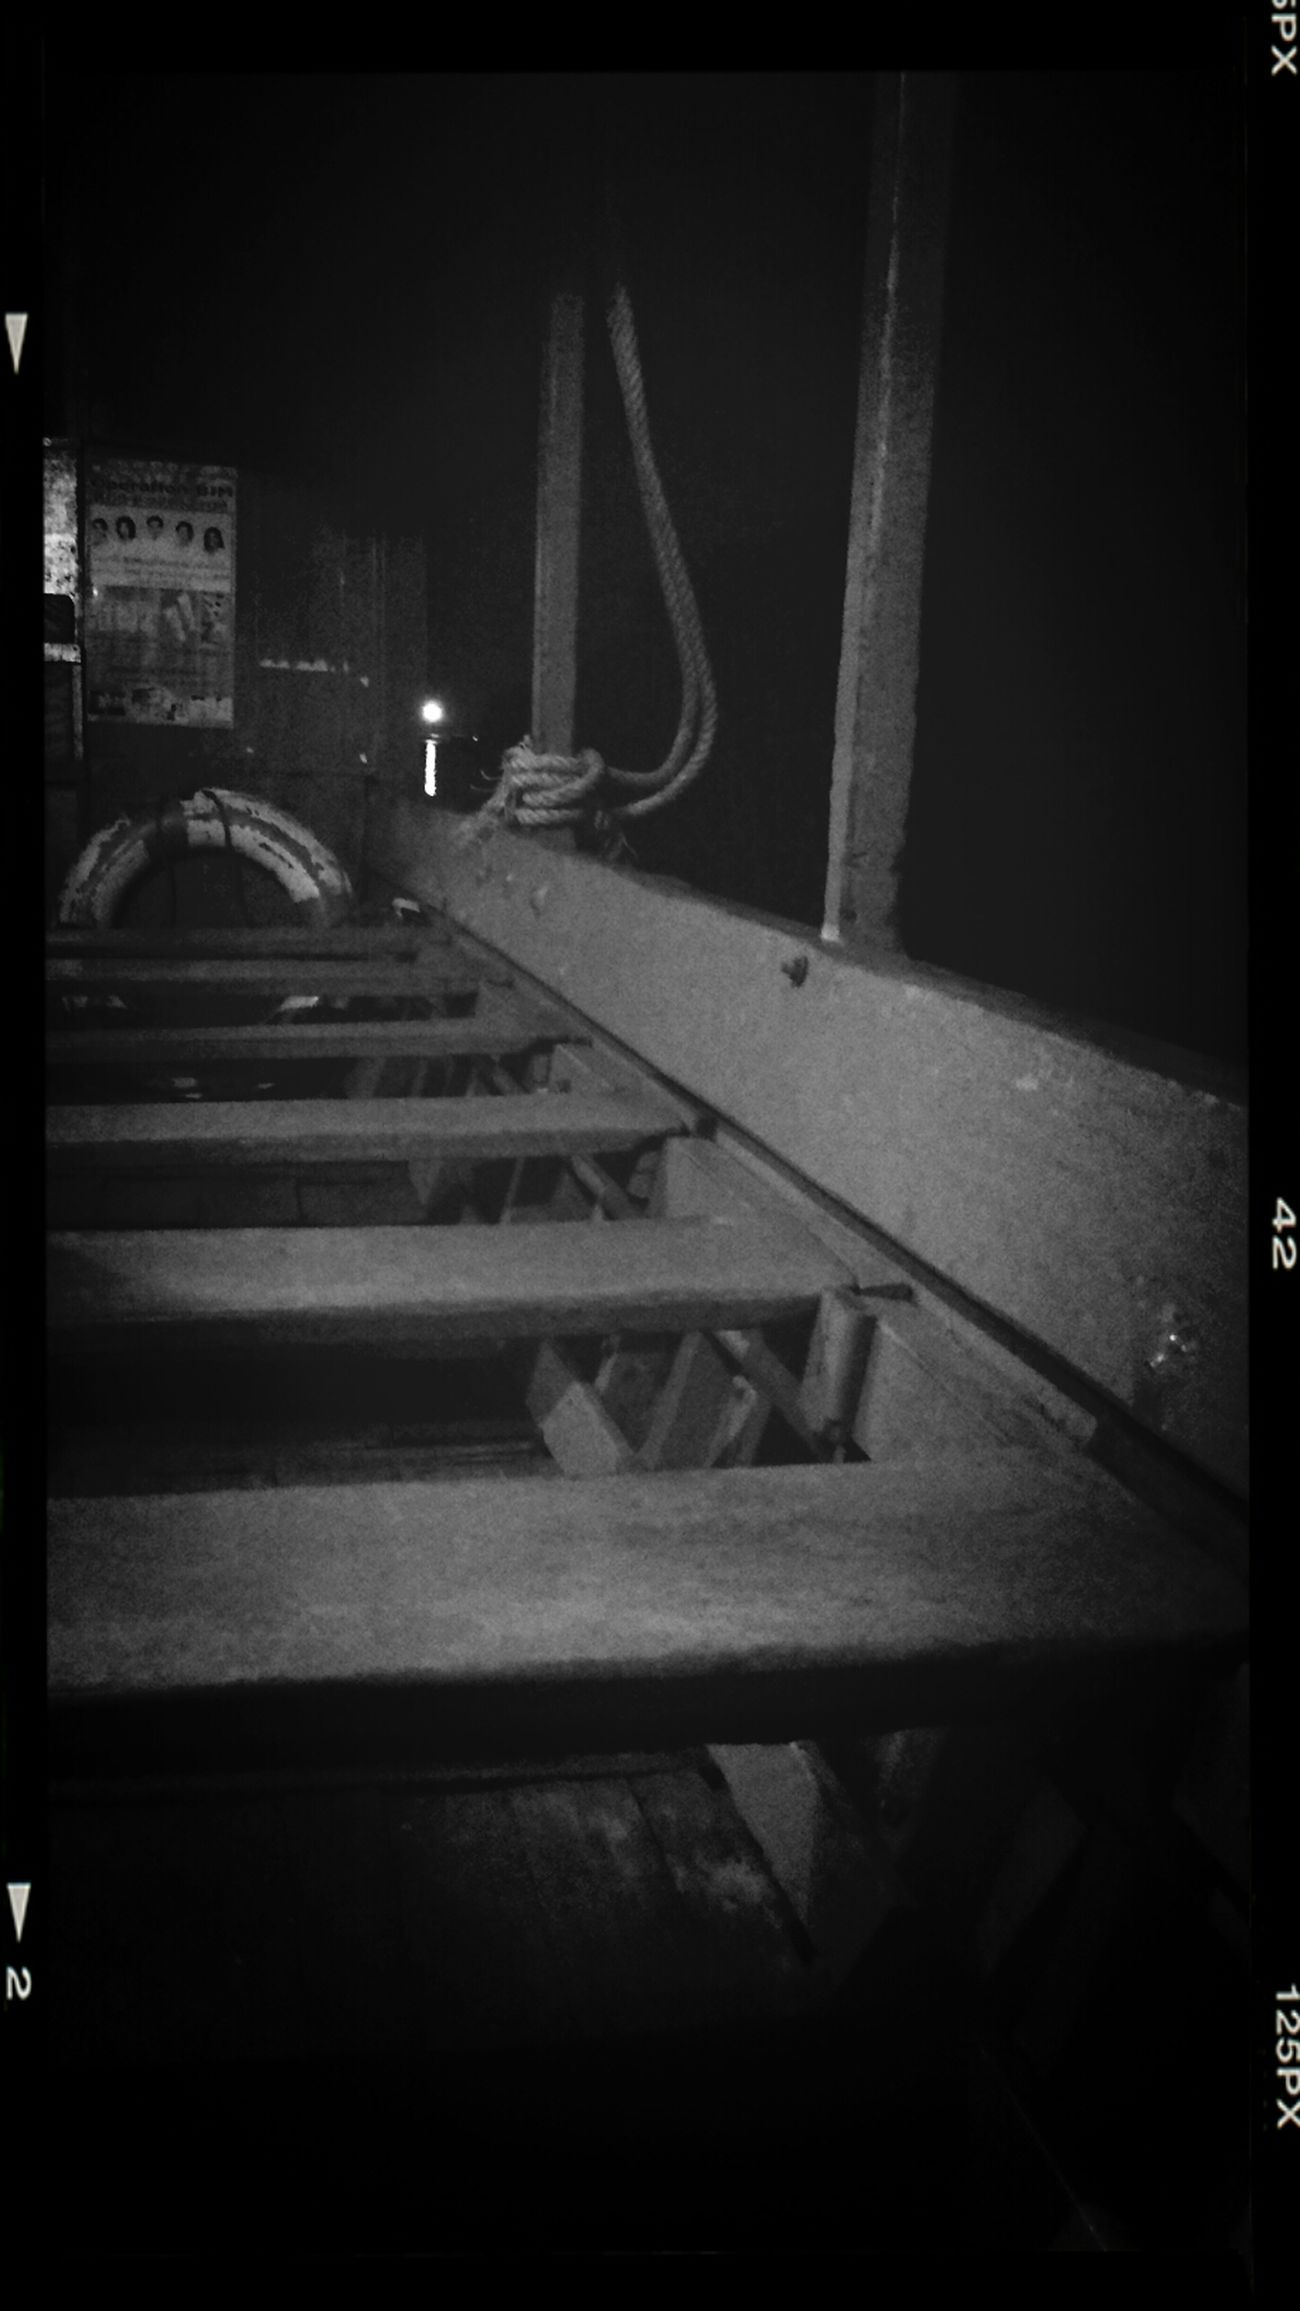 Nightphotography Boat Empty Blackandwhite